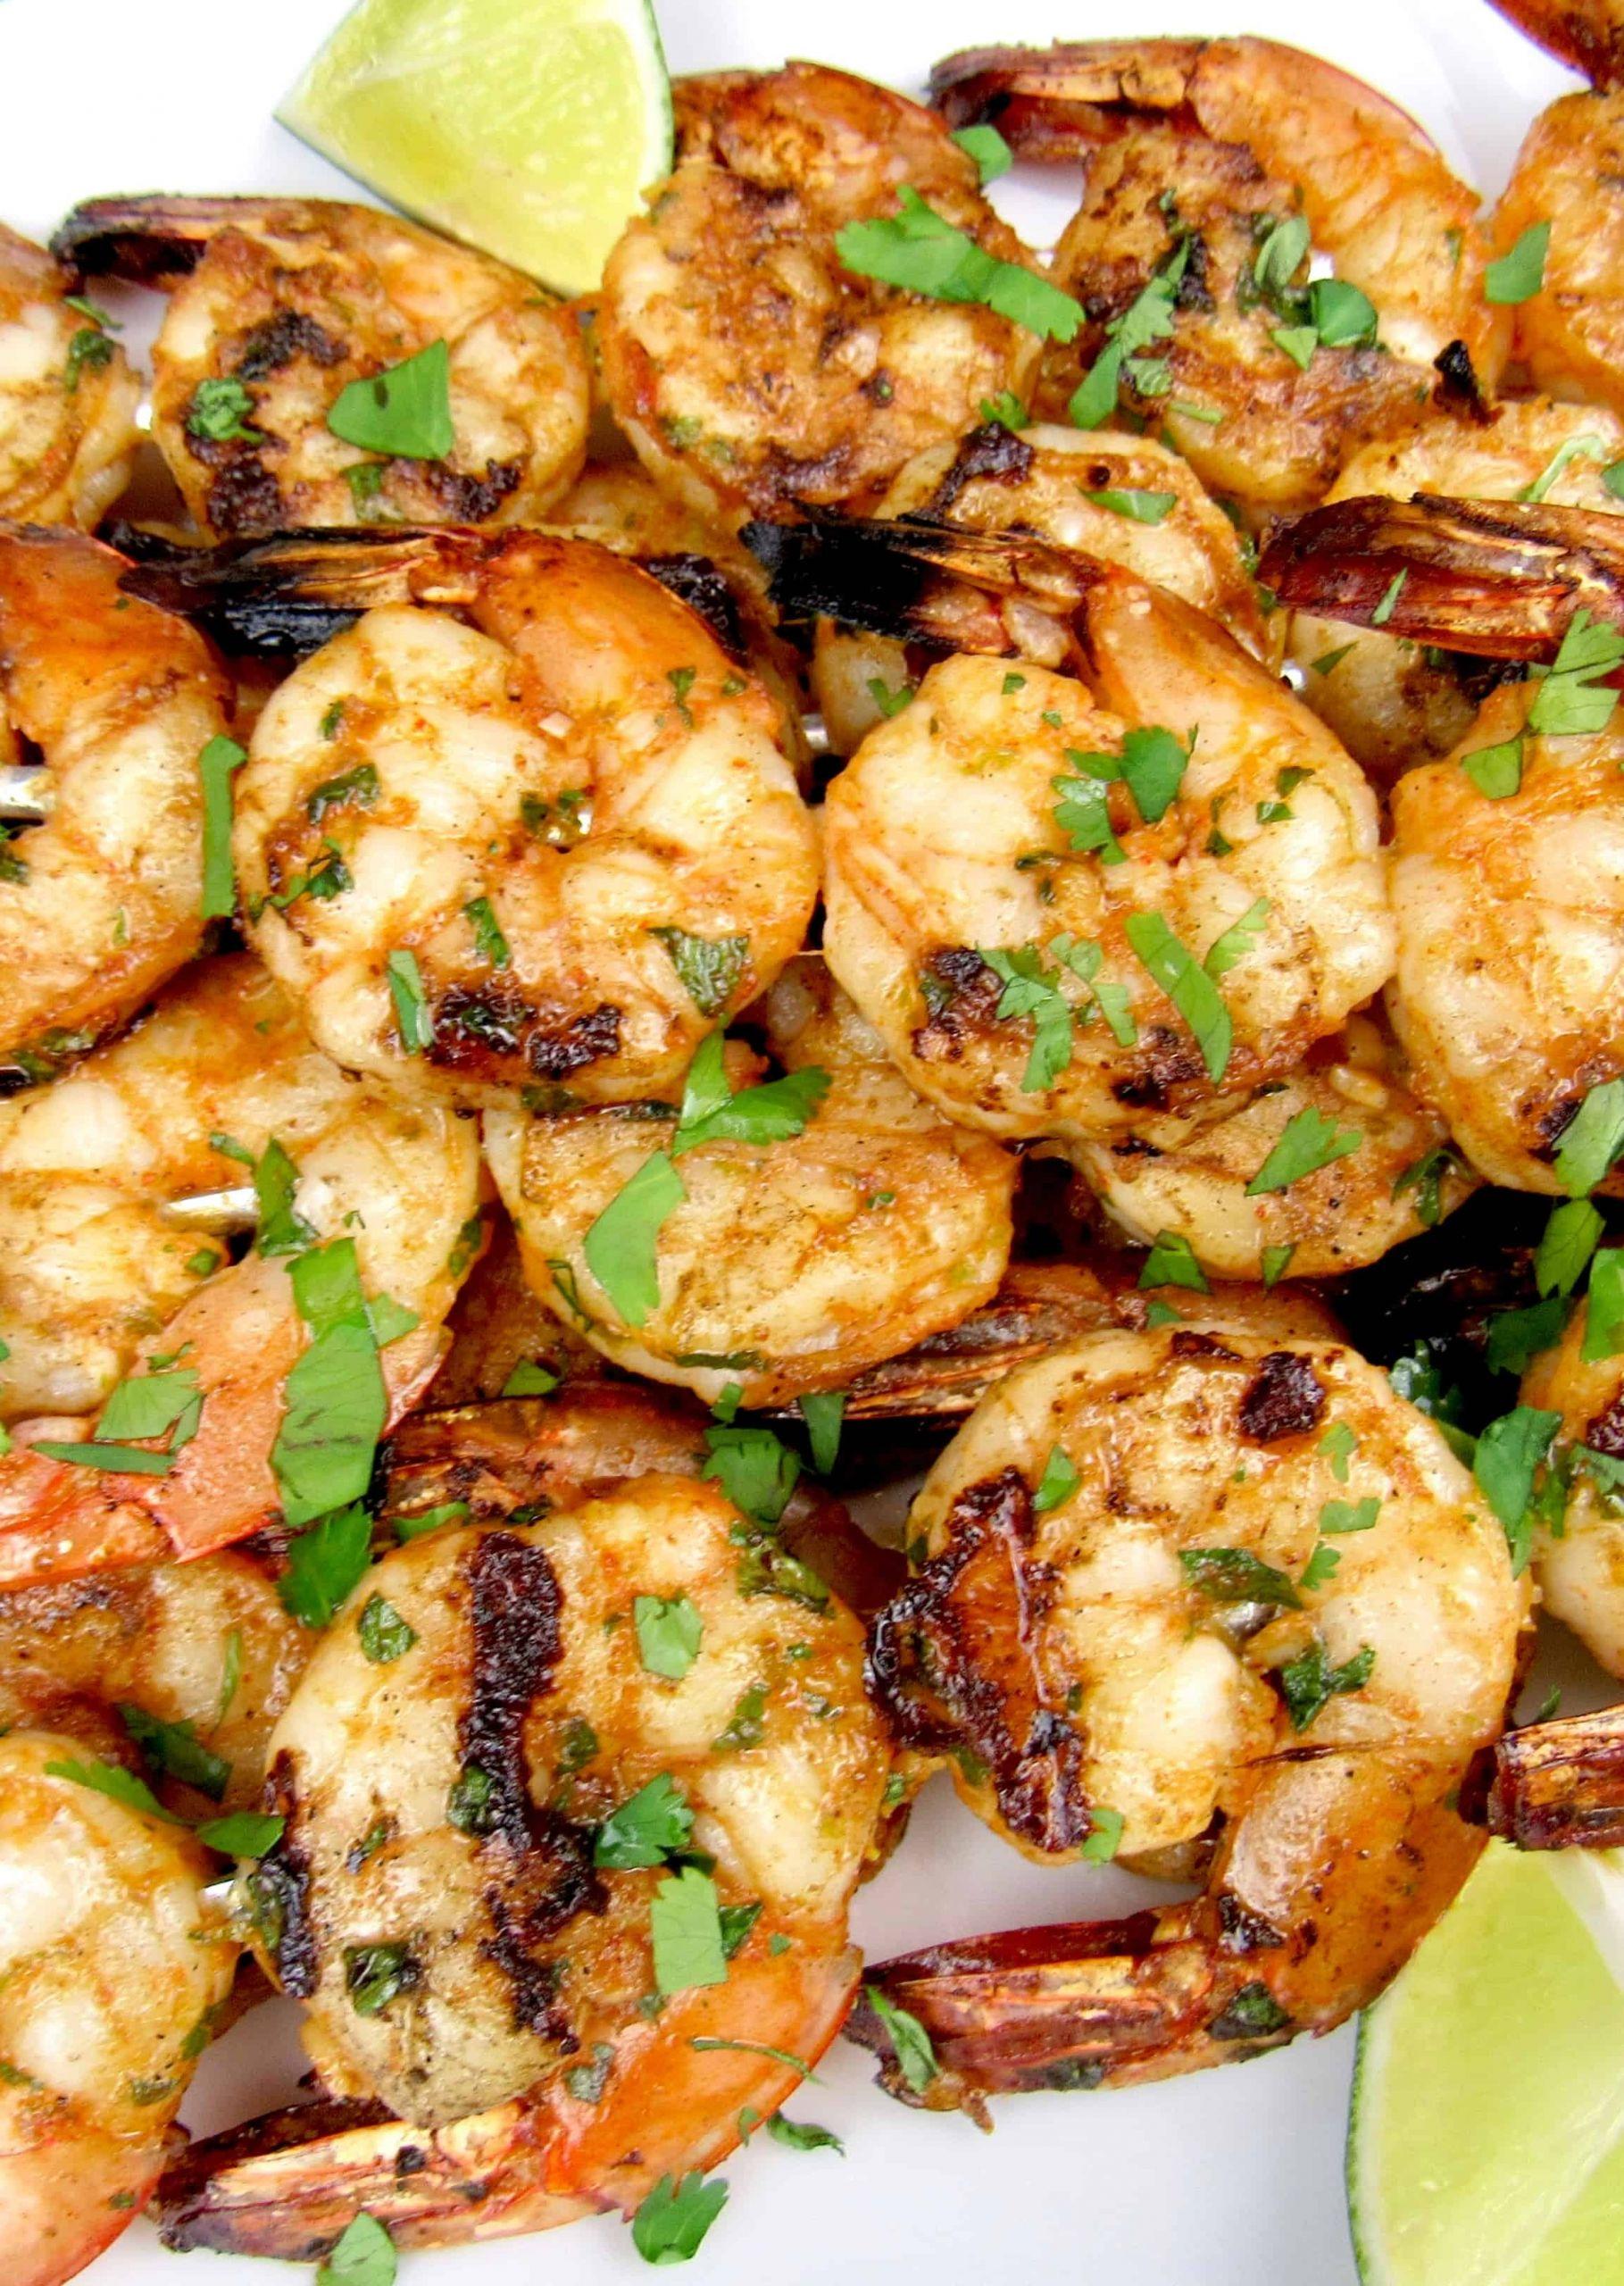 Grilled Shrimp Keto  Grilled Lime Cilantro Shrimp Skewers Keto and Low Carb